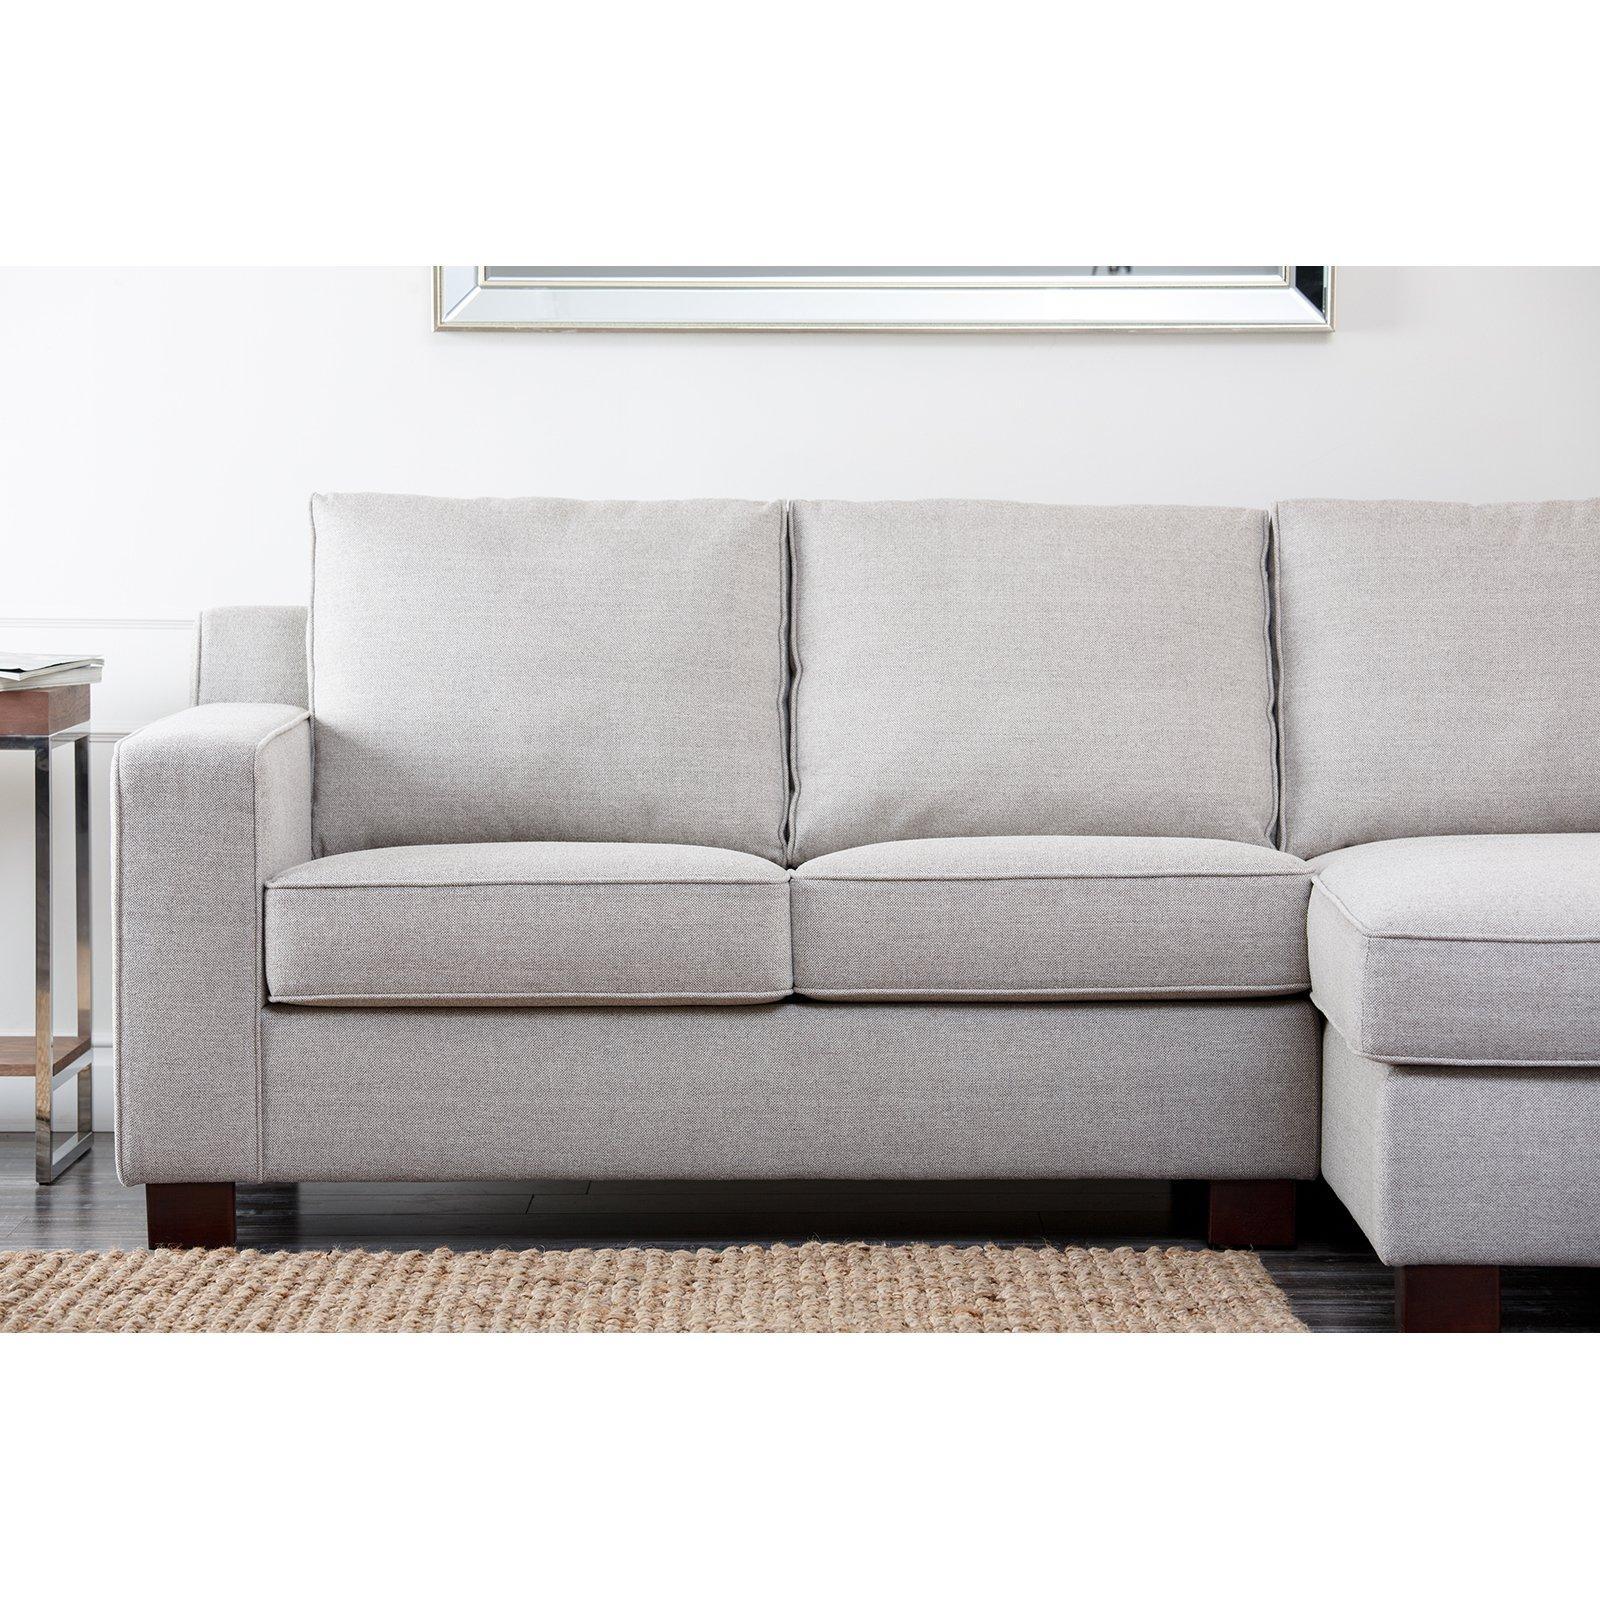 Abbyson Regina Sectional Sofa – Gray | Hayneedle In Abbyson Sectional Sofas (Image 8 of 20)